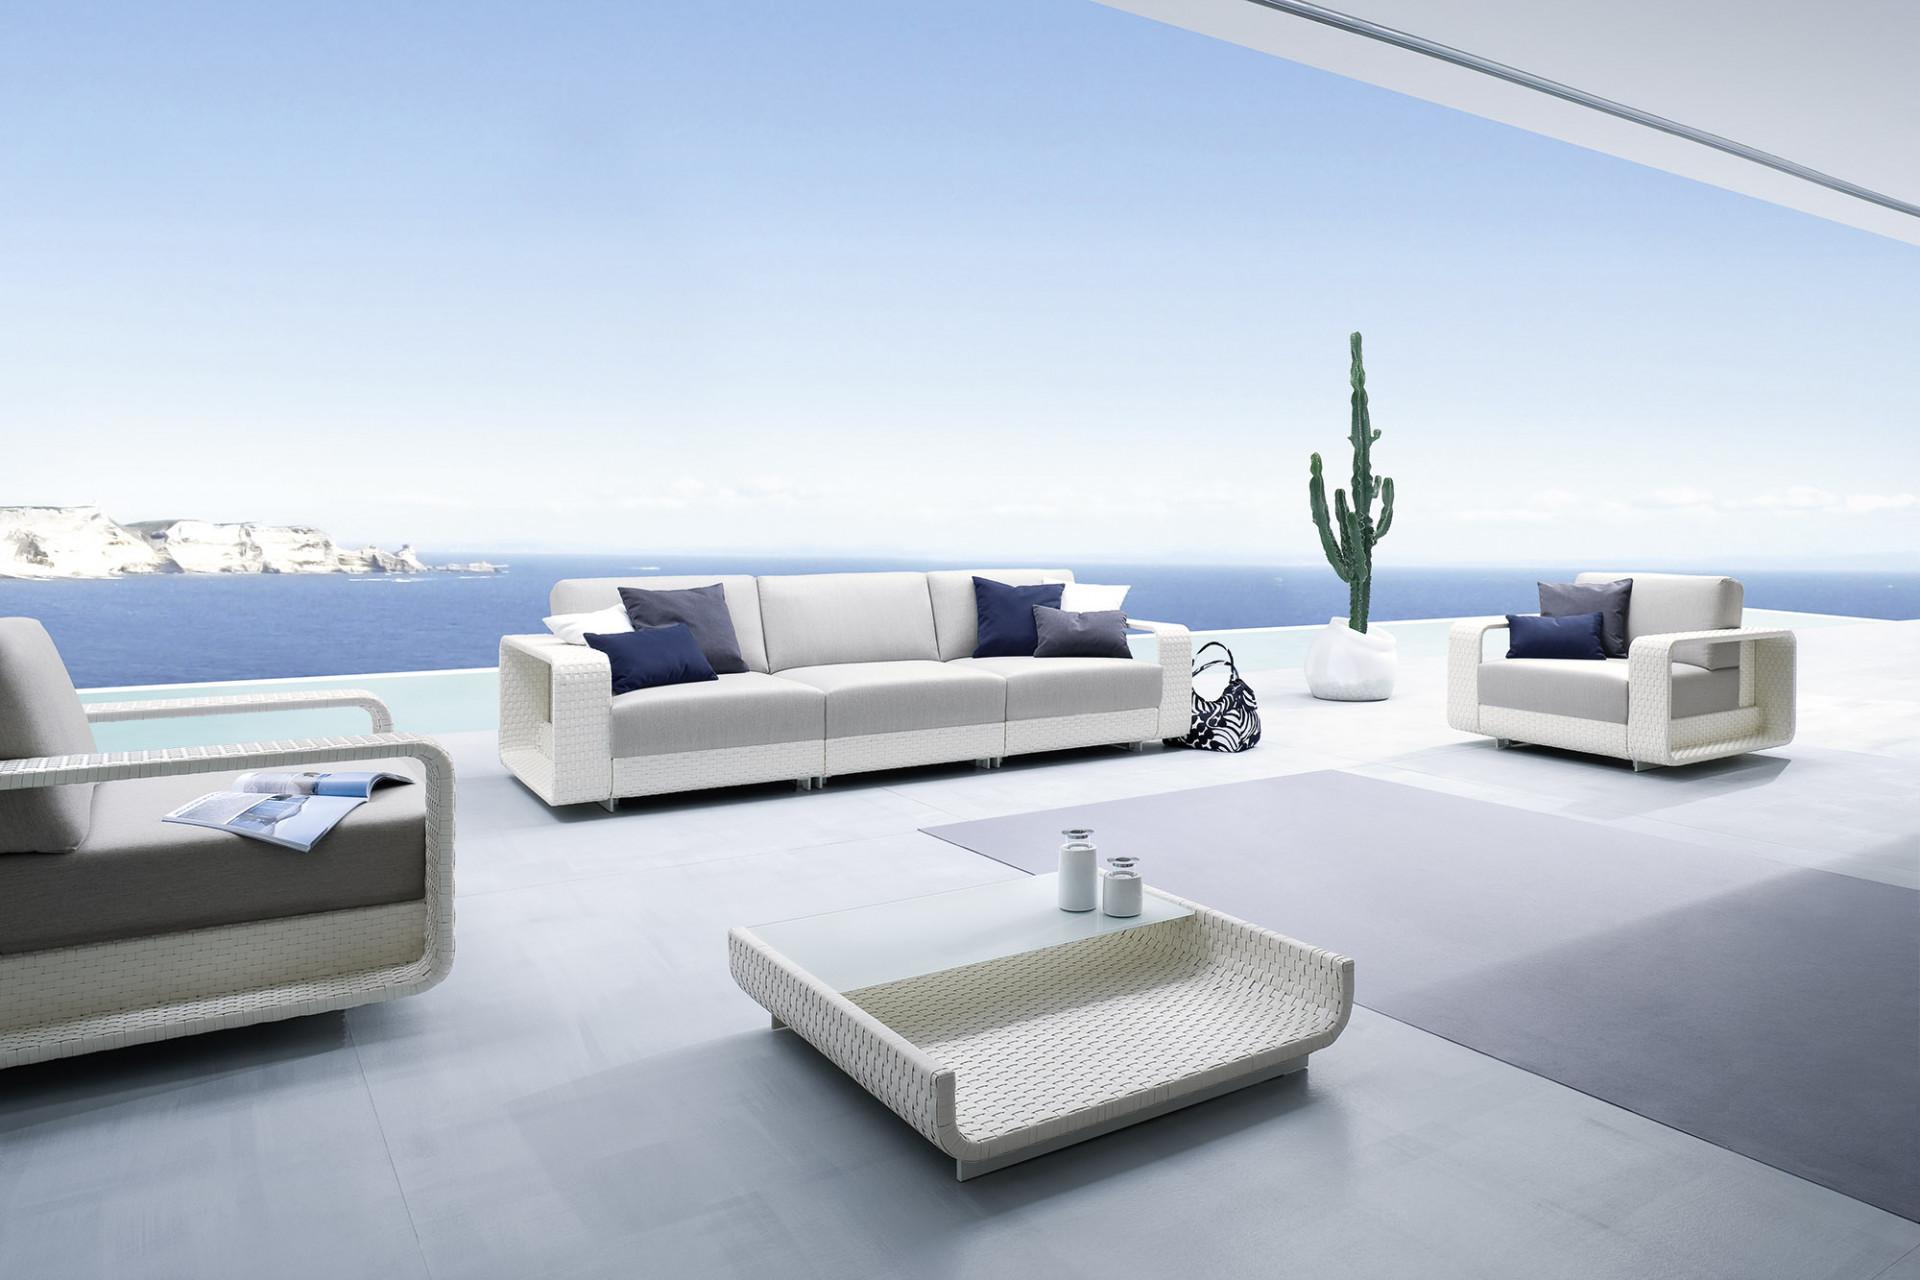 art. 9611-9613-9607 Hamptons bianco perla